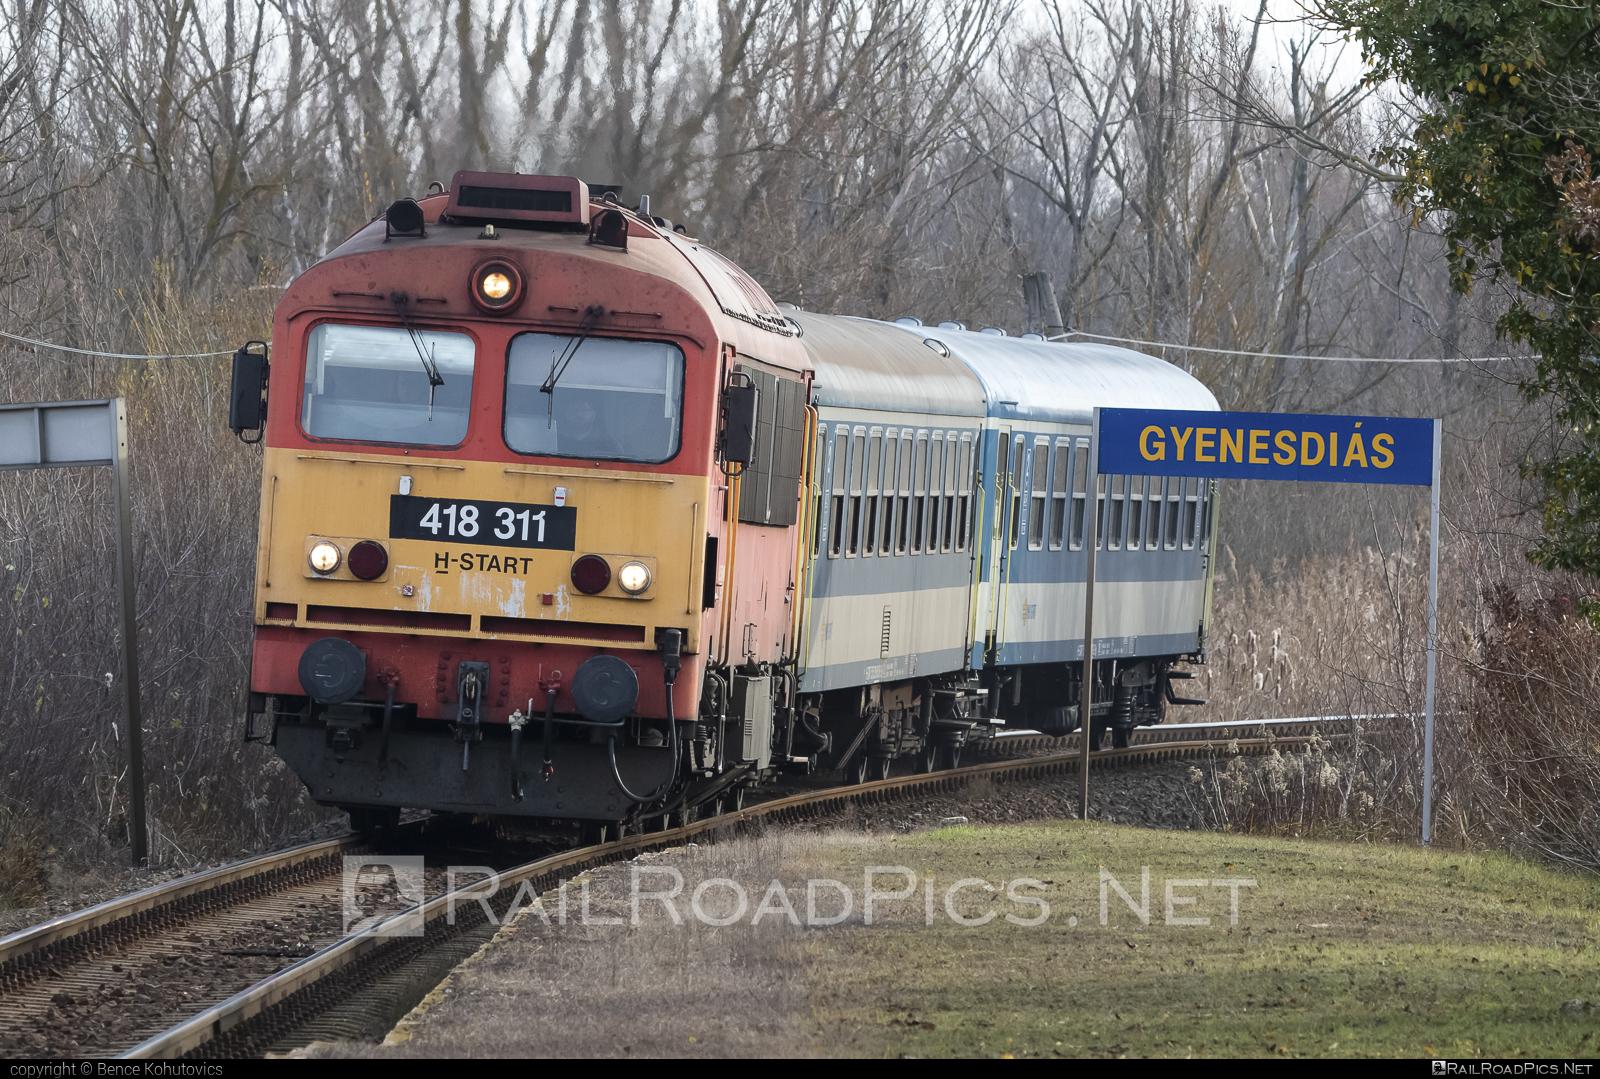 Ganz-MÁVAG DHM7-4 - 418 311 operated by MÁV-START ZRt. #dhm7 #dhm74 #ganzm41 #ganzmavag #ganzmavag418 #ganzmavagdhm7 #ganzmavagdhm74 #ganzmavagm41 #m41locomotive #mavstart #mavstartzrt